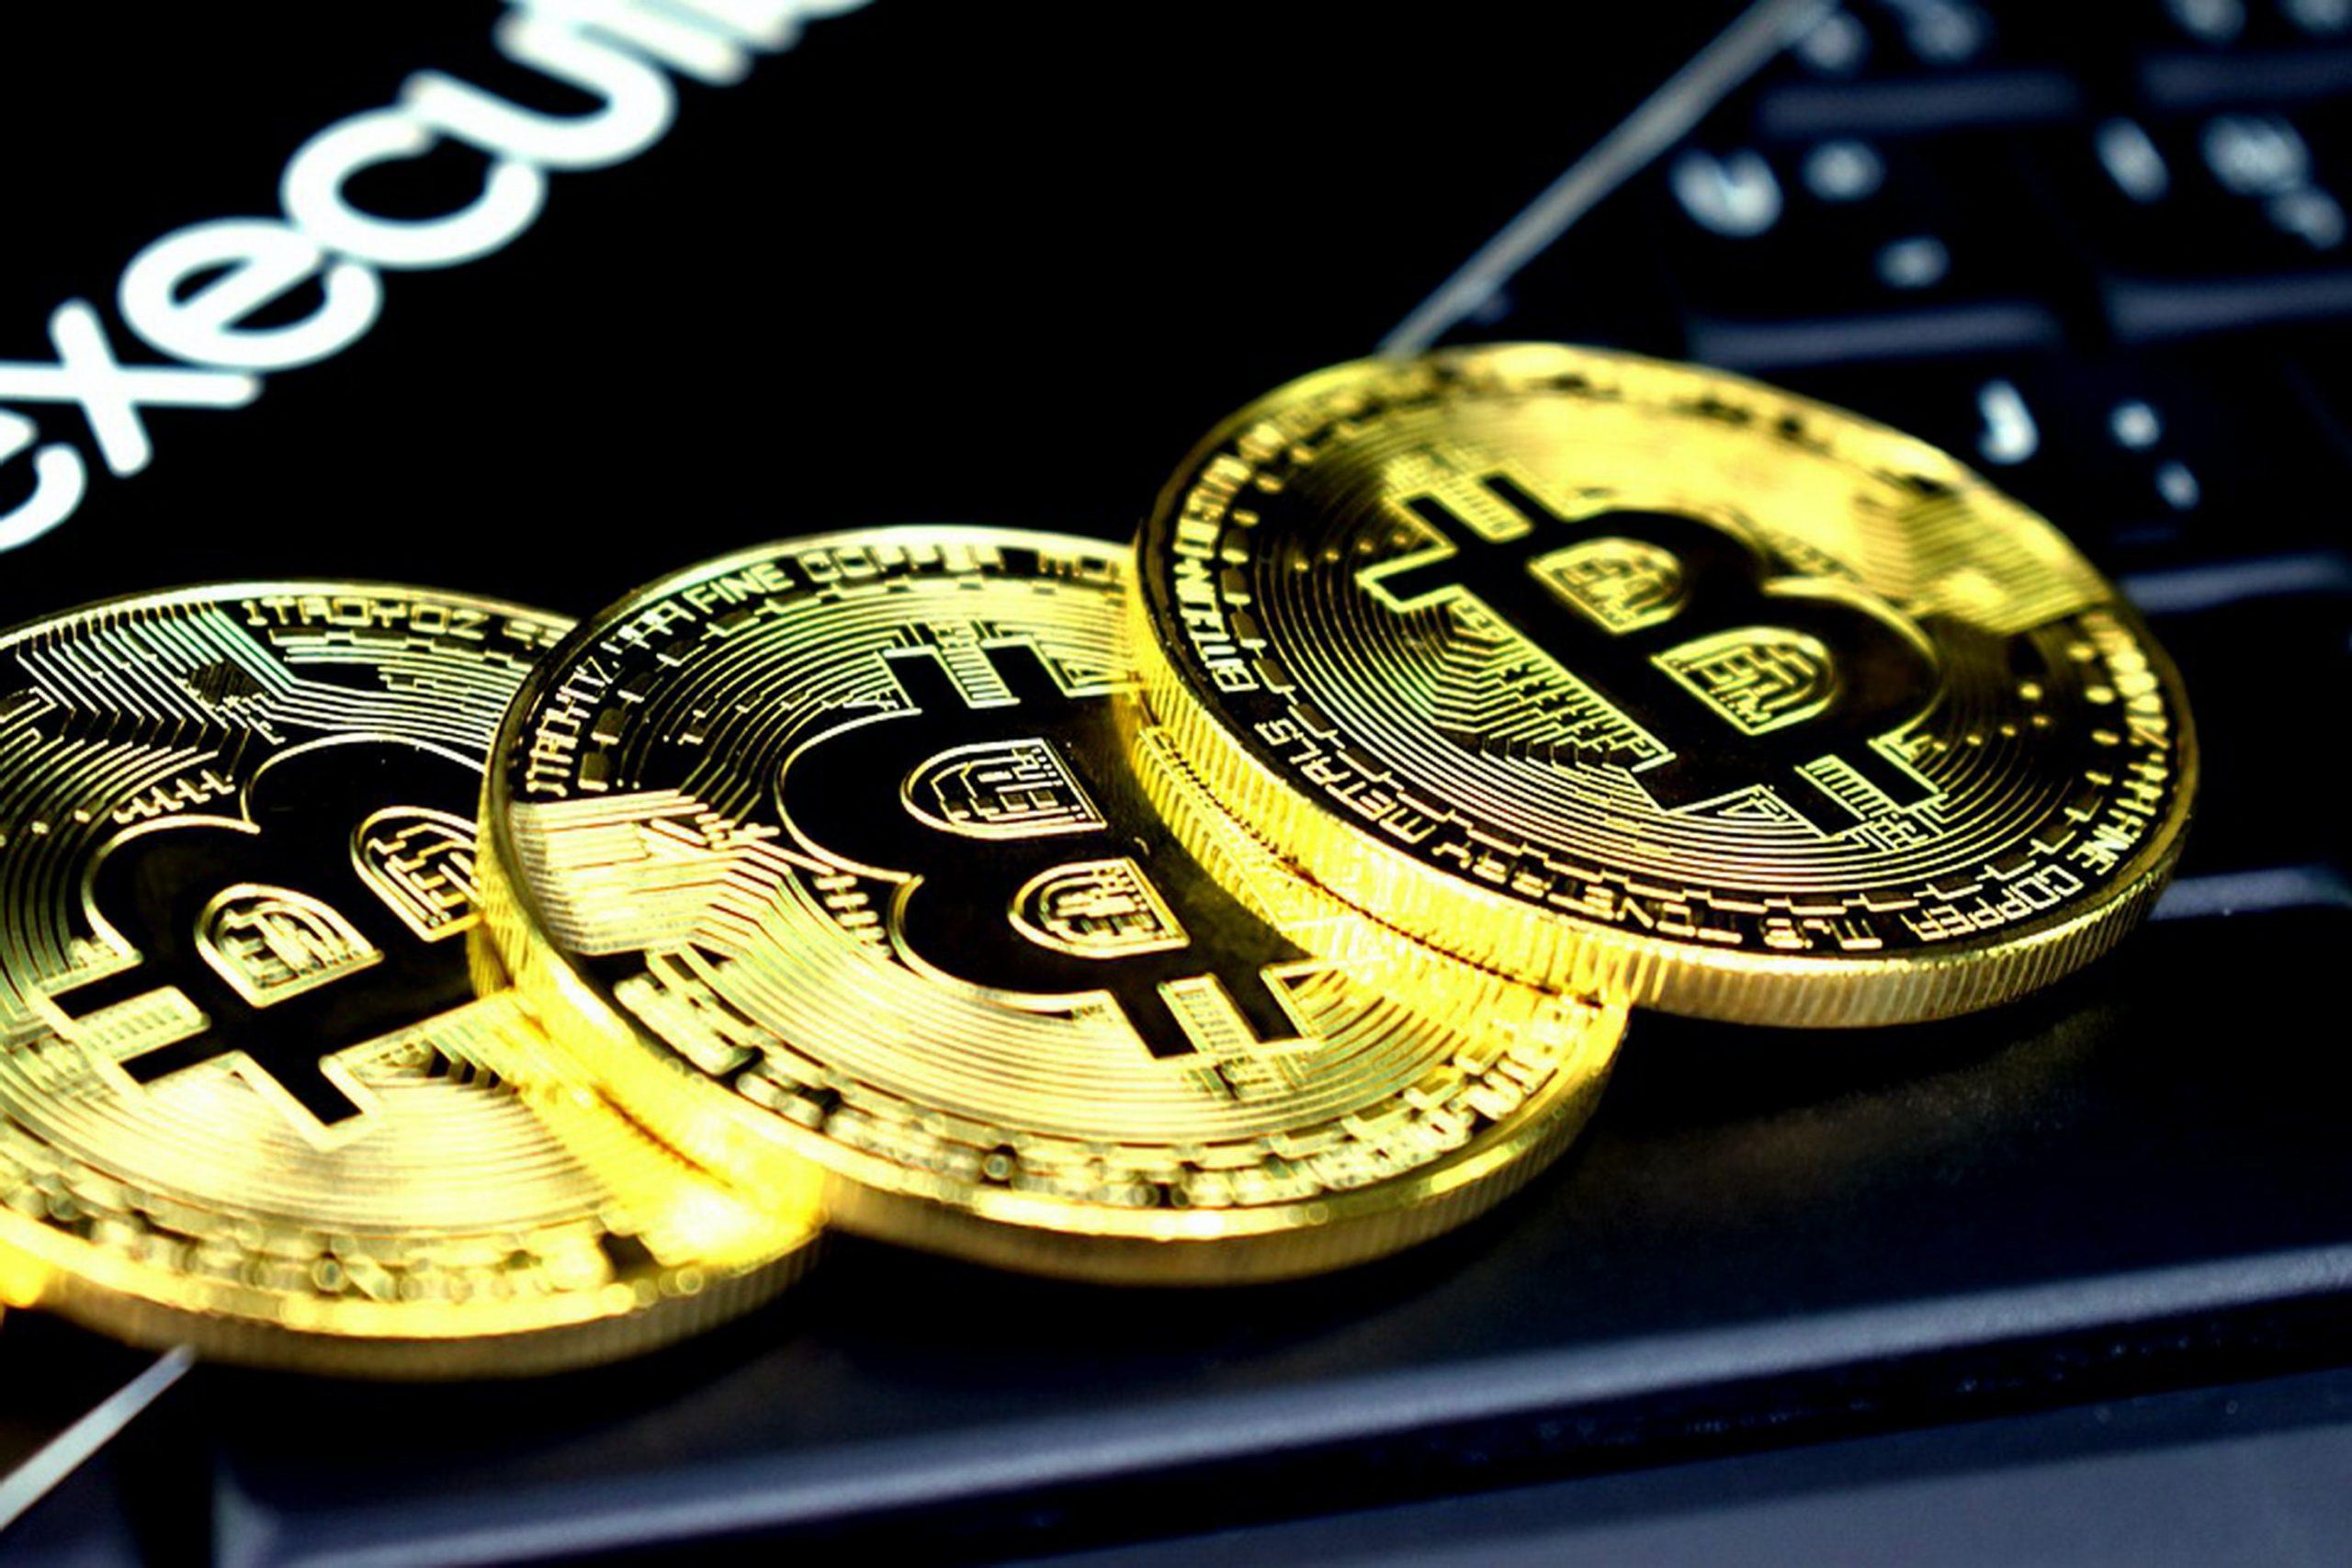 Bitcoin Investors are Buying More Bitcoin